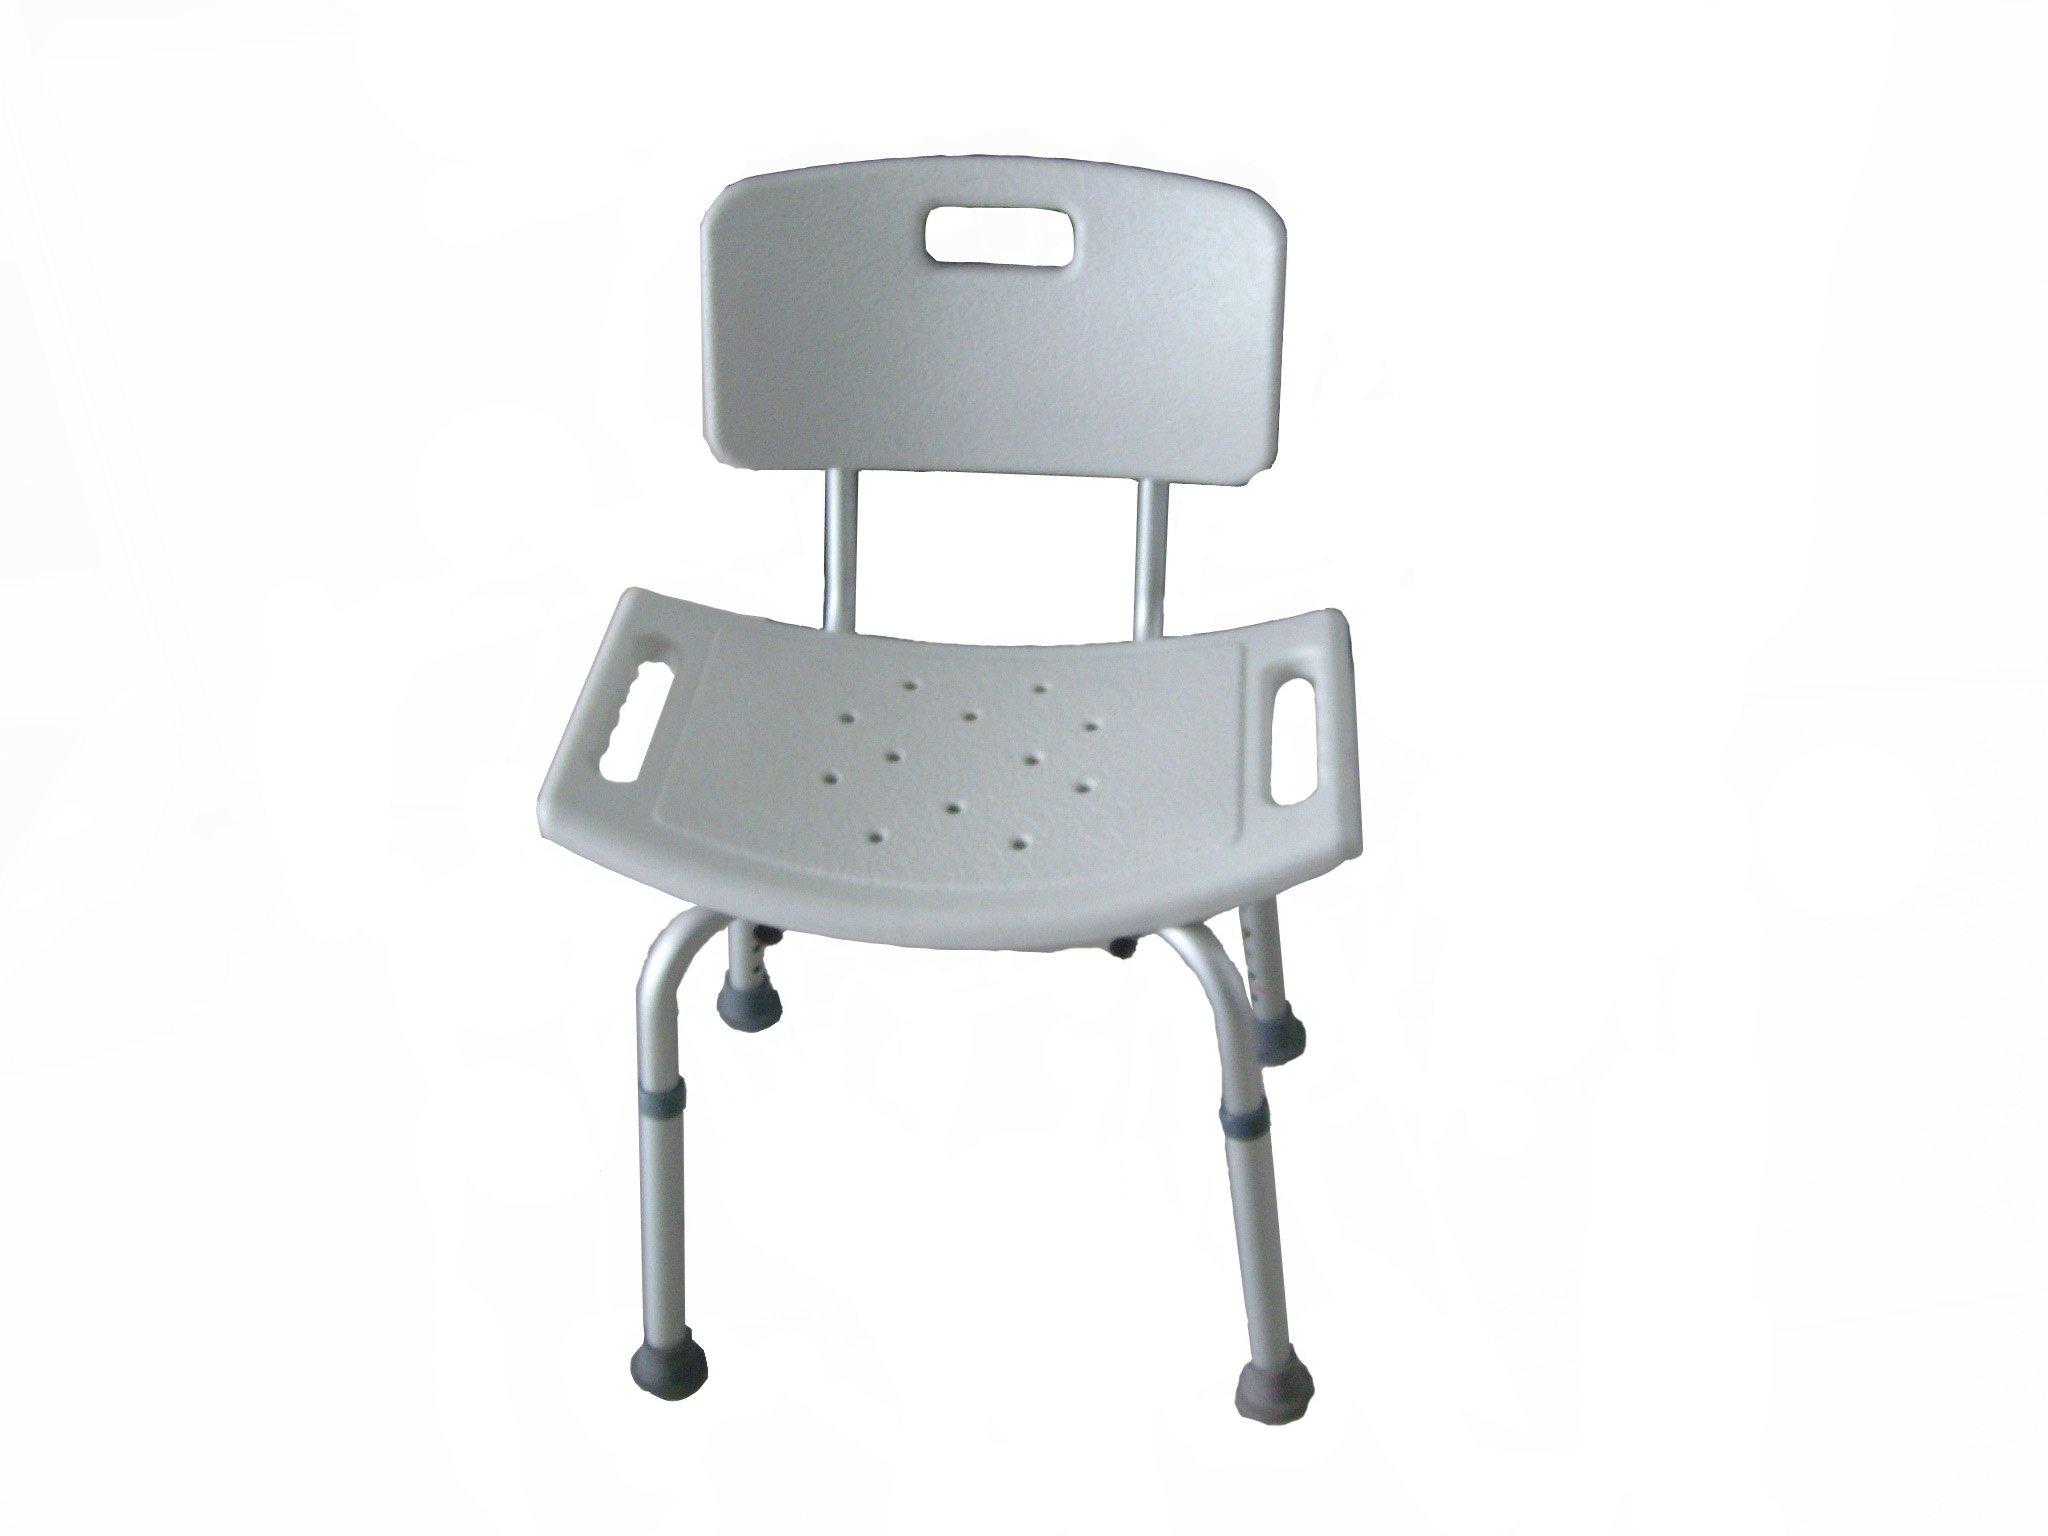 Sedile Per Doccia : Doccia in plastica sedia sedile per doccia doccia panchina buy